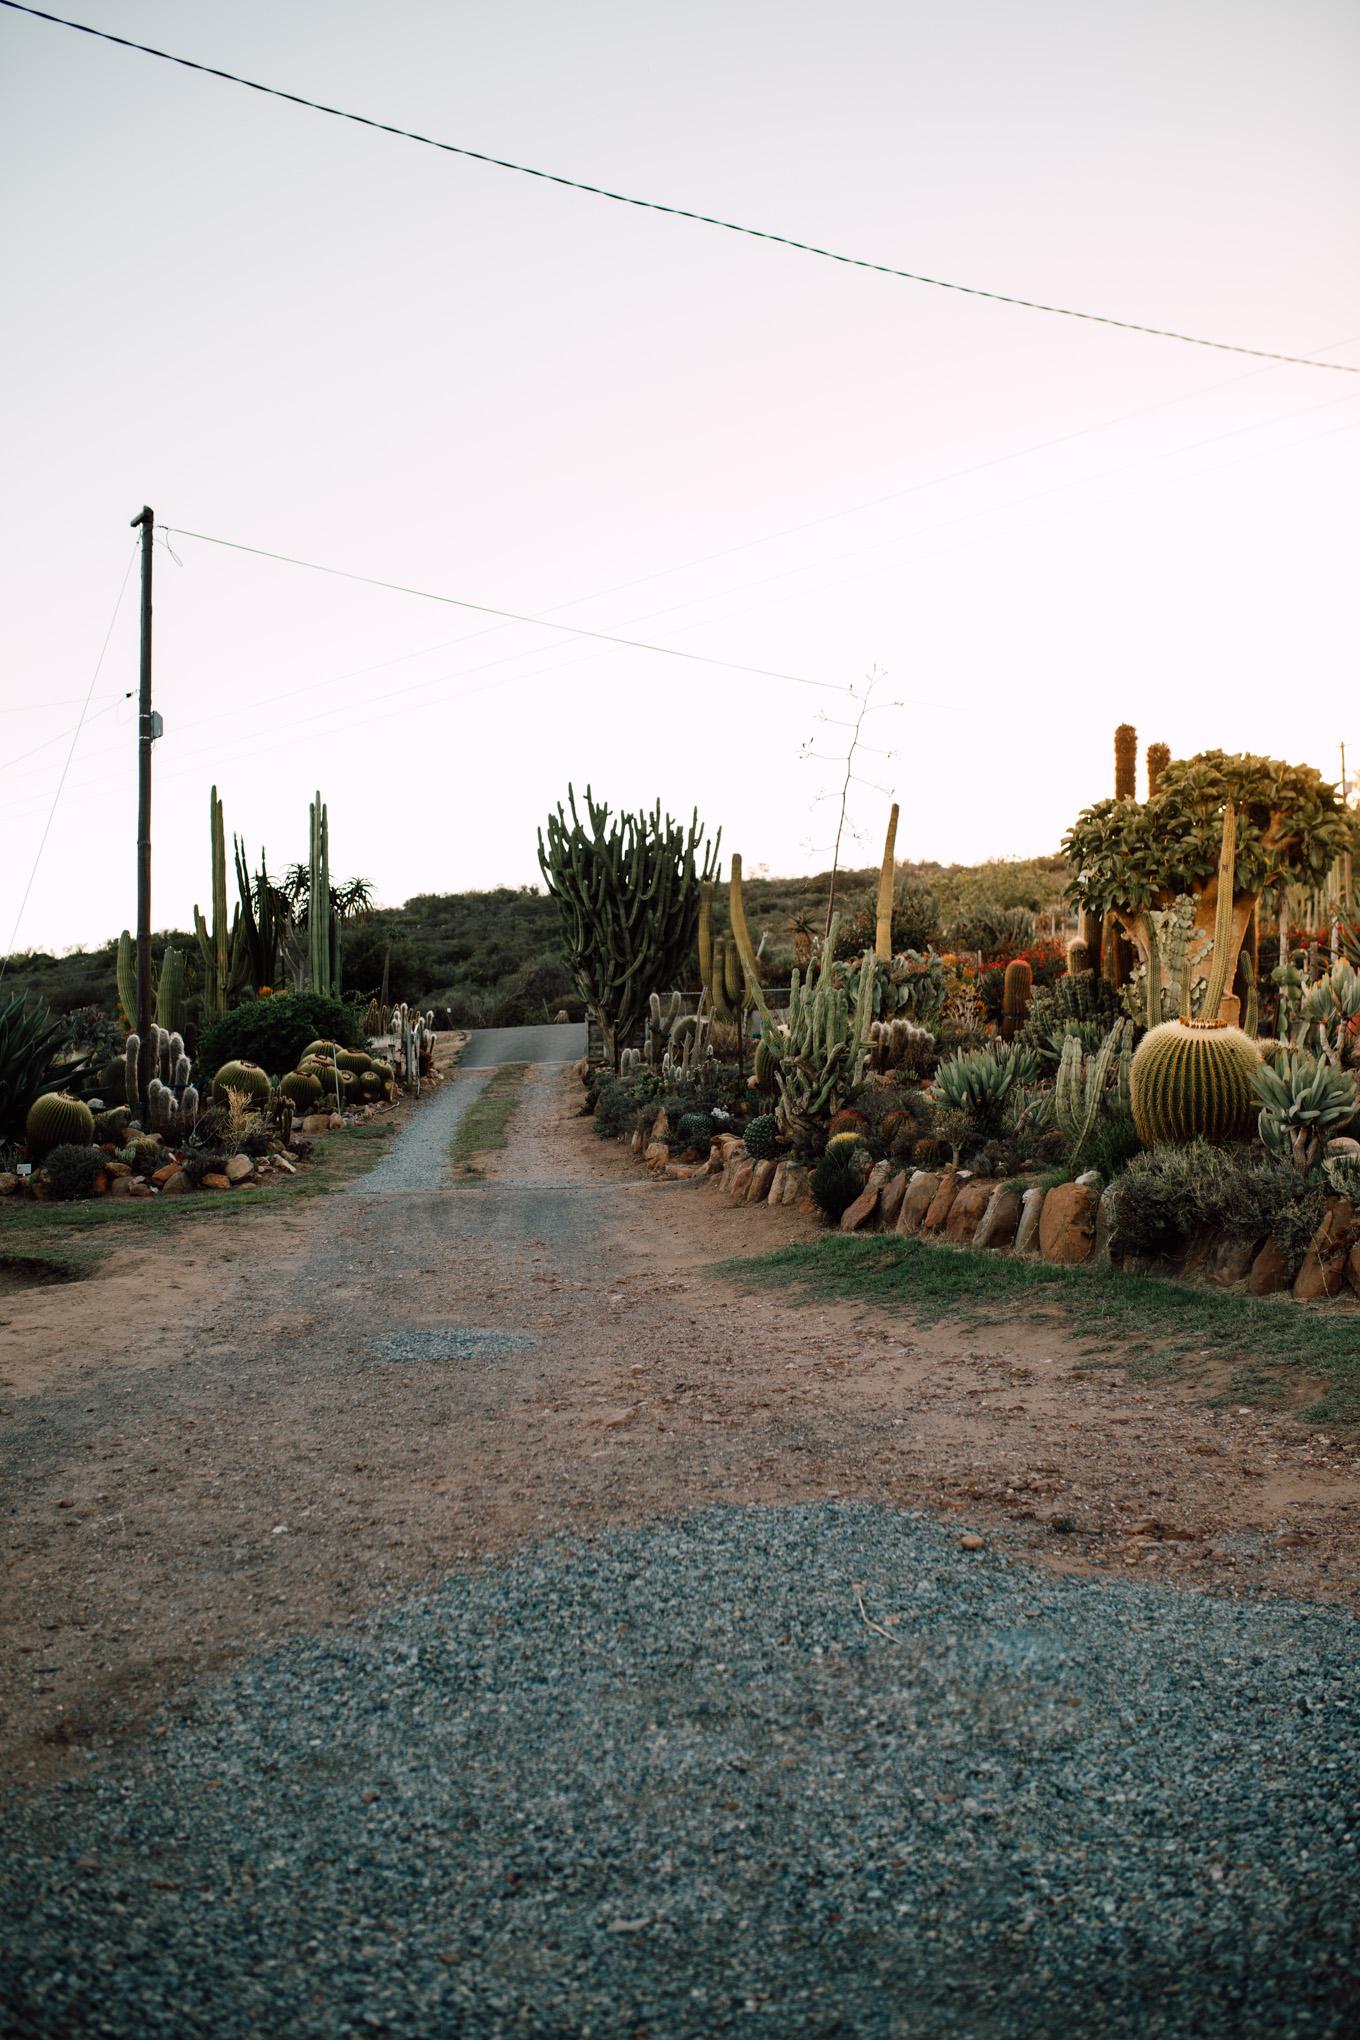 Cape-Town-Pia-Anna-Christian-Wedding-Photography-South-Africa-Bride-Cactus-3.jpg